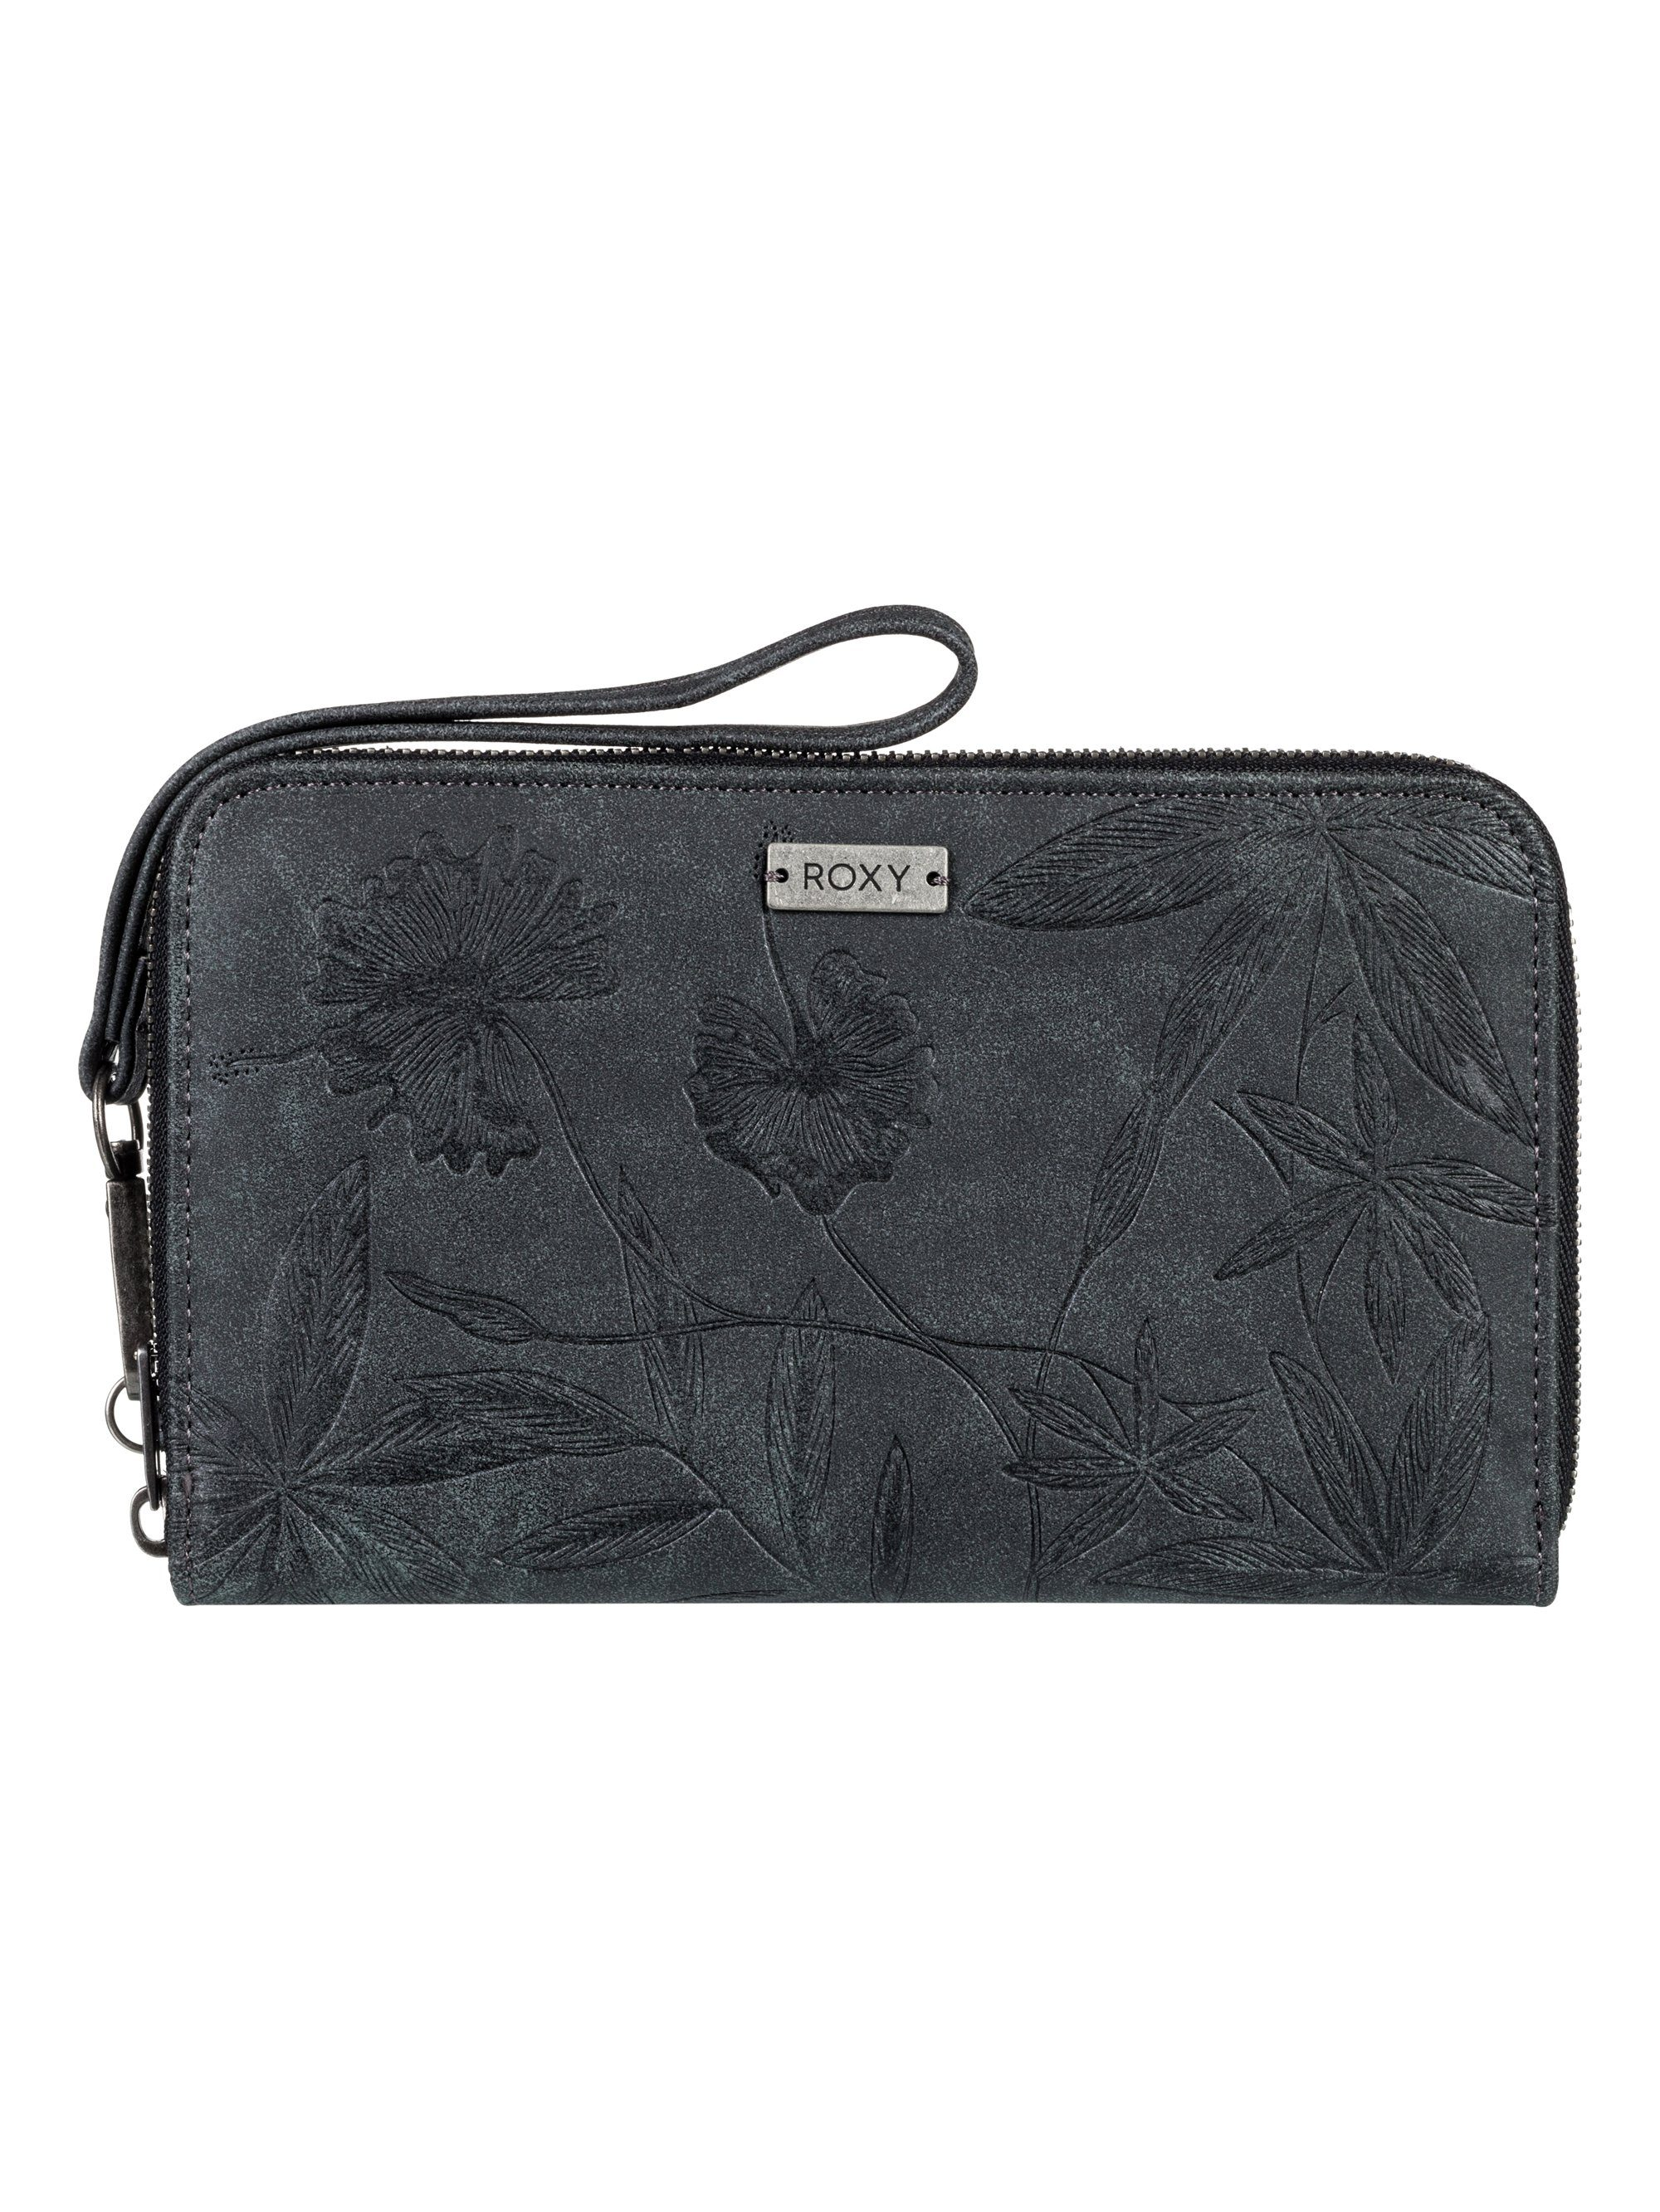 fde62c840af Roxy dames portemonnee zwart Zwarte portemonnee dames roxy .